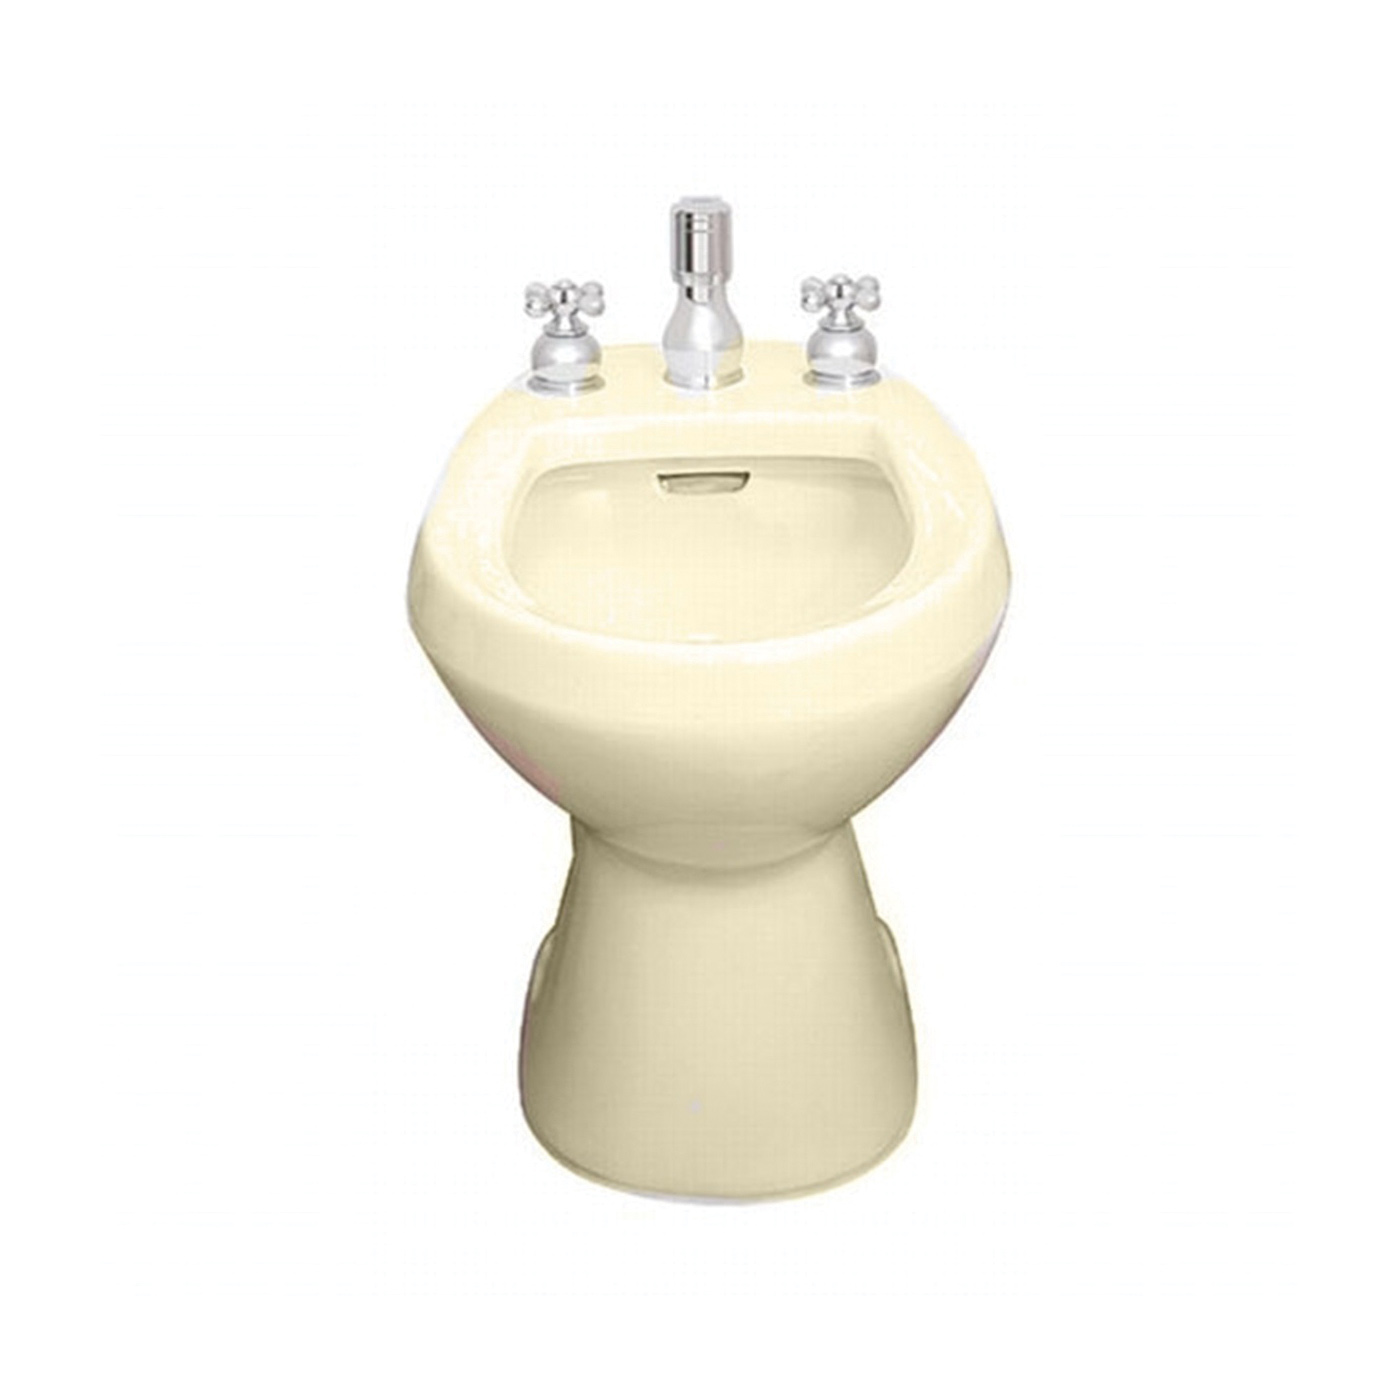 American Standard 5023.100.021 Cadet® Bidet Toilet With (2) Bolt Caps, Elongated Bowl, 14-7/8 in H Rim, 13-1/2 in Rough-In, Bone, Import